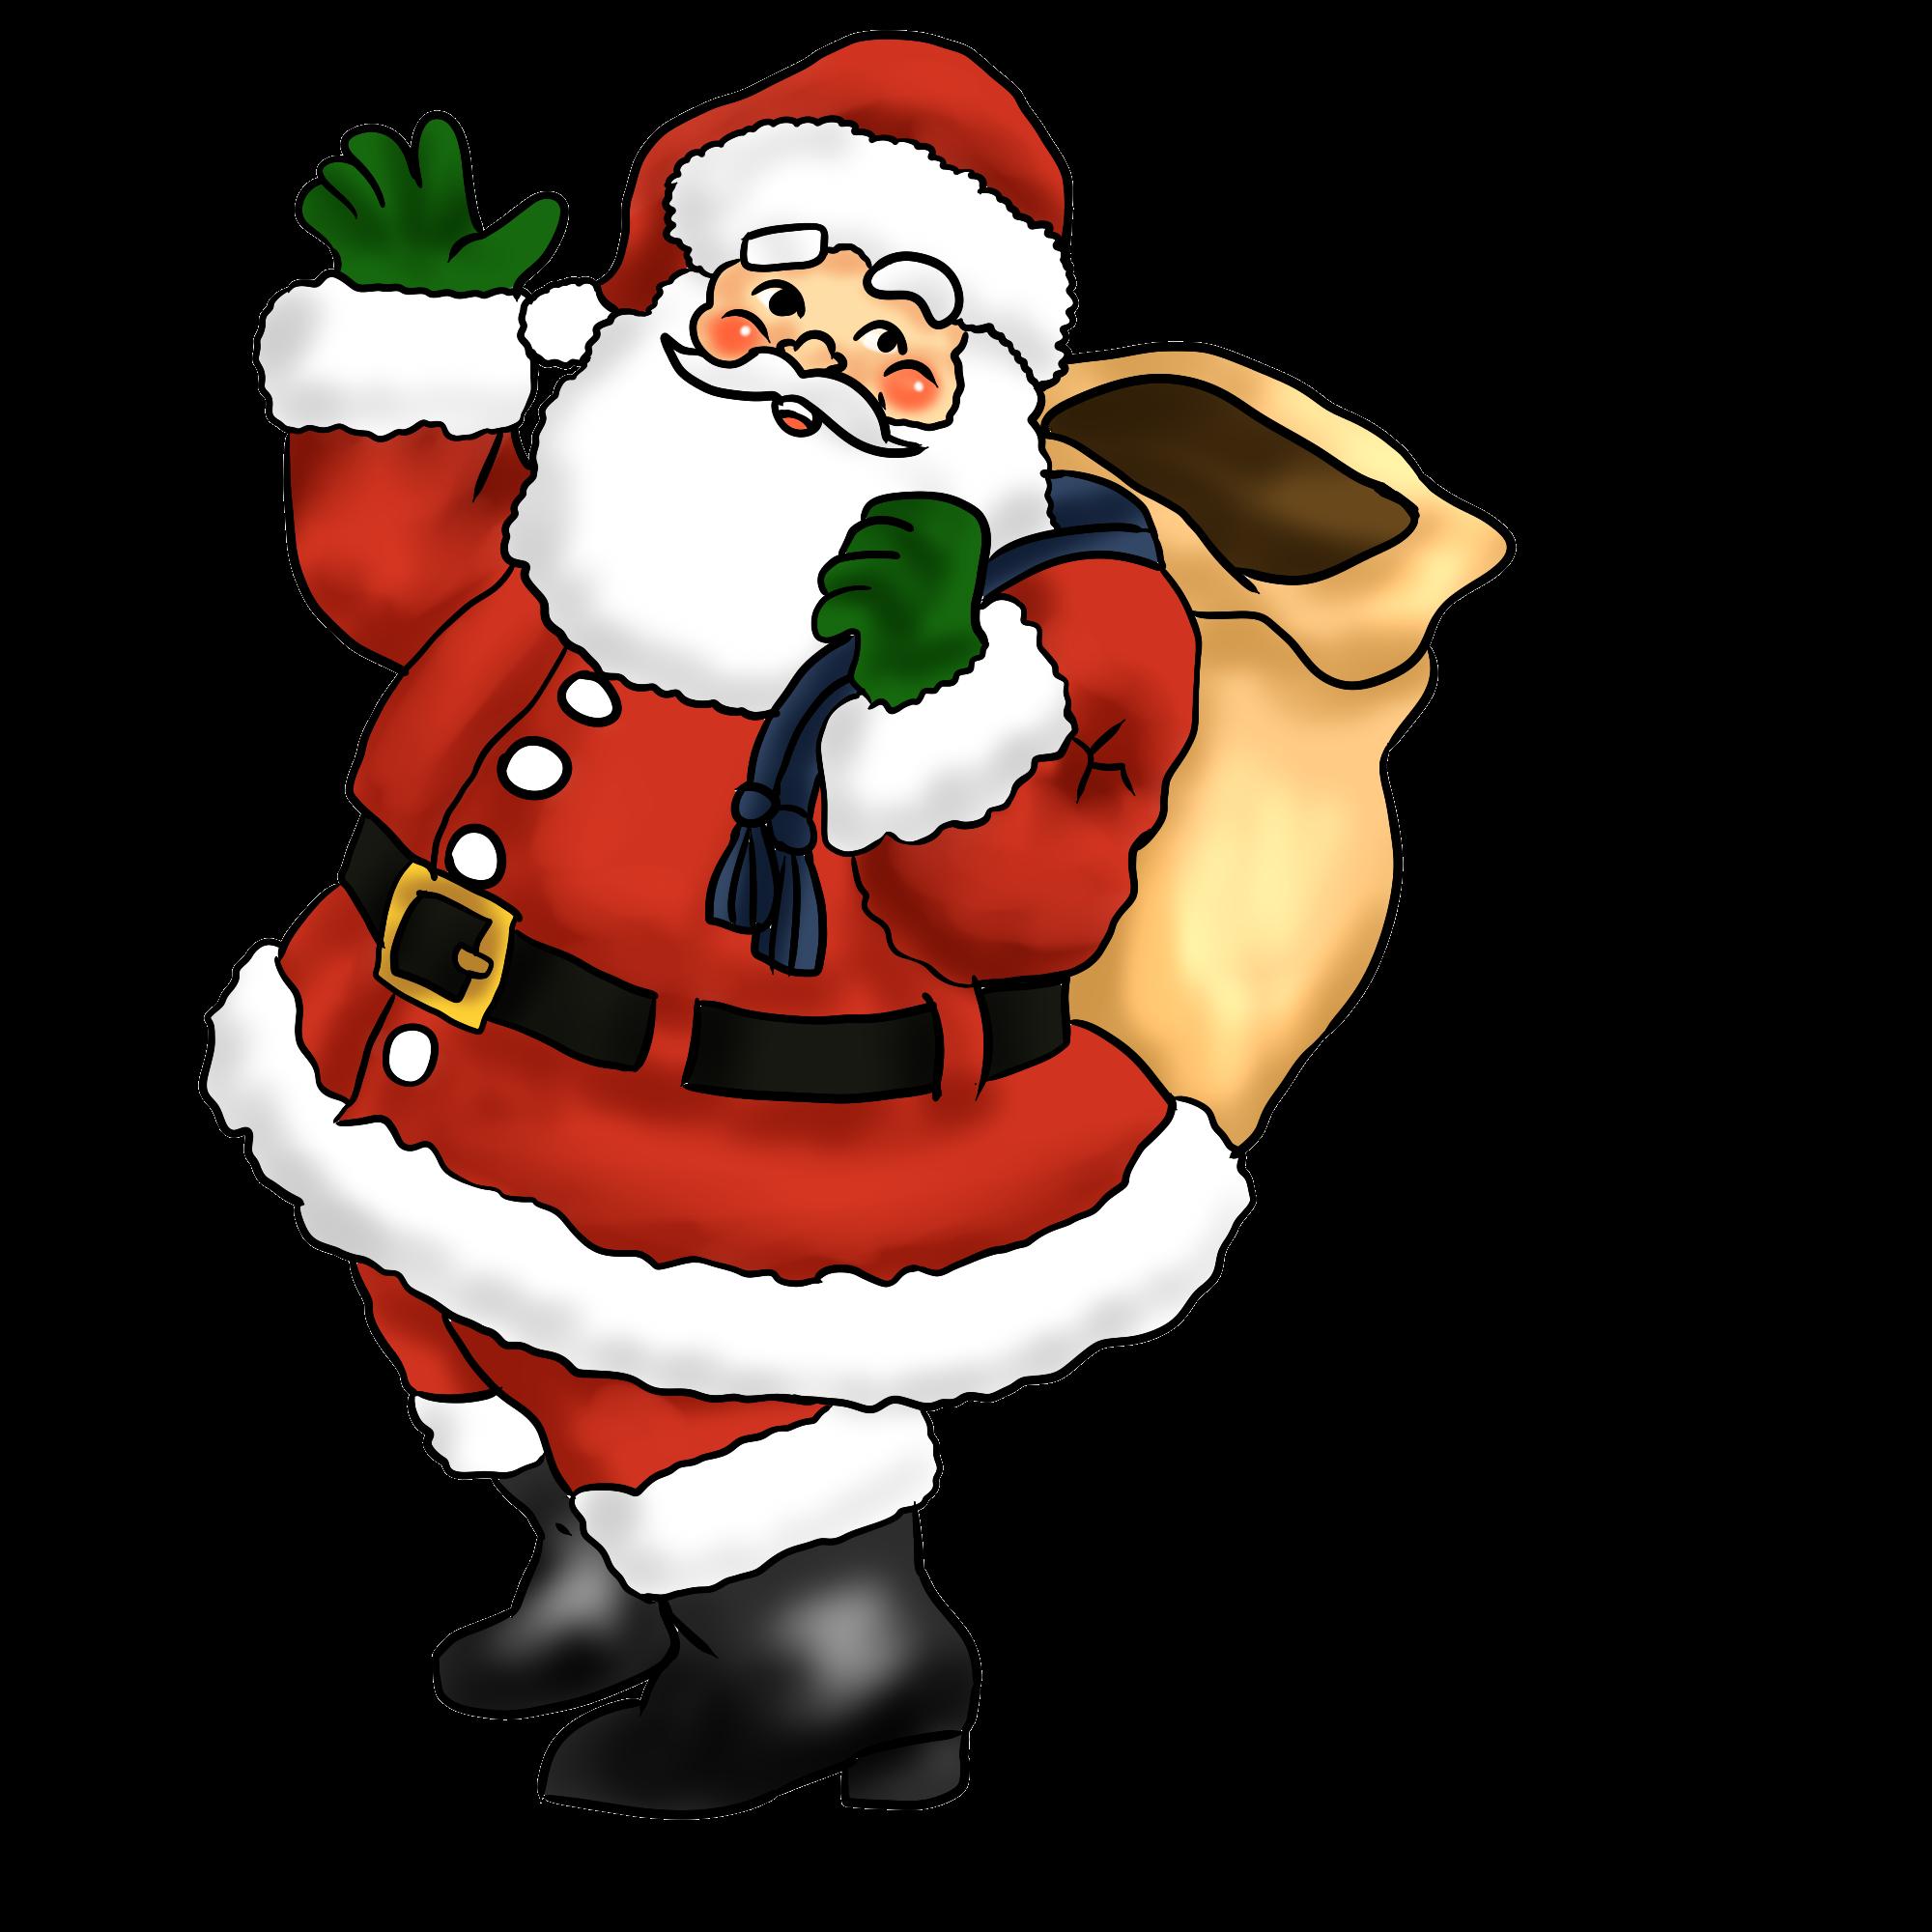 Free Lovely Santa Claus Clip Art-Free Lovely Santa Claus Clip Art-2